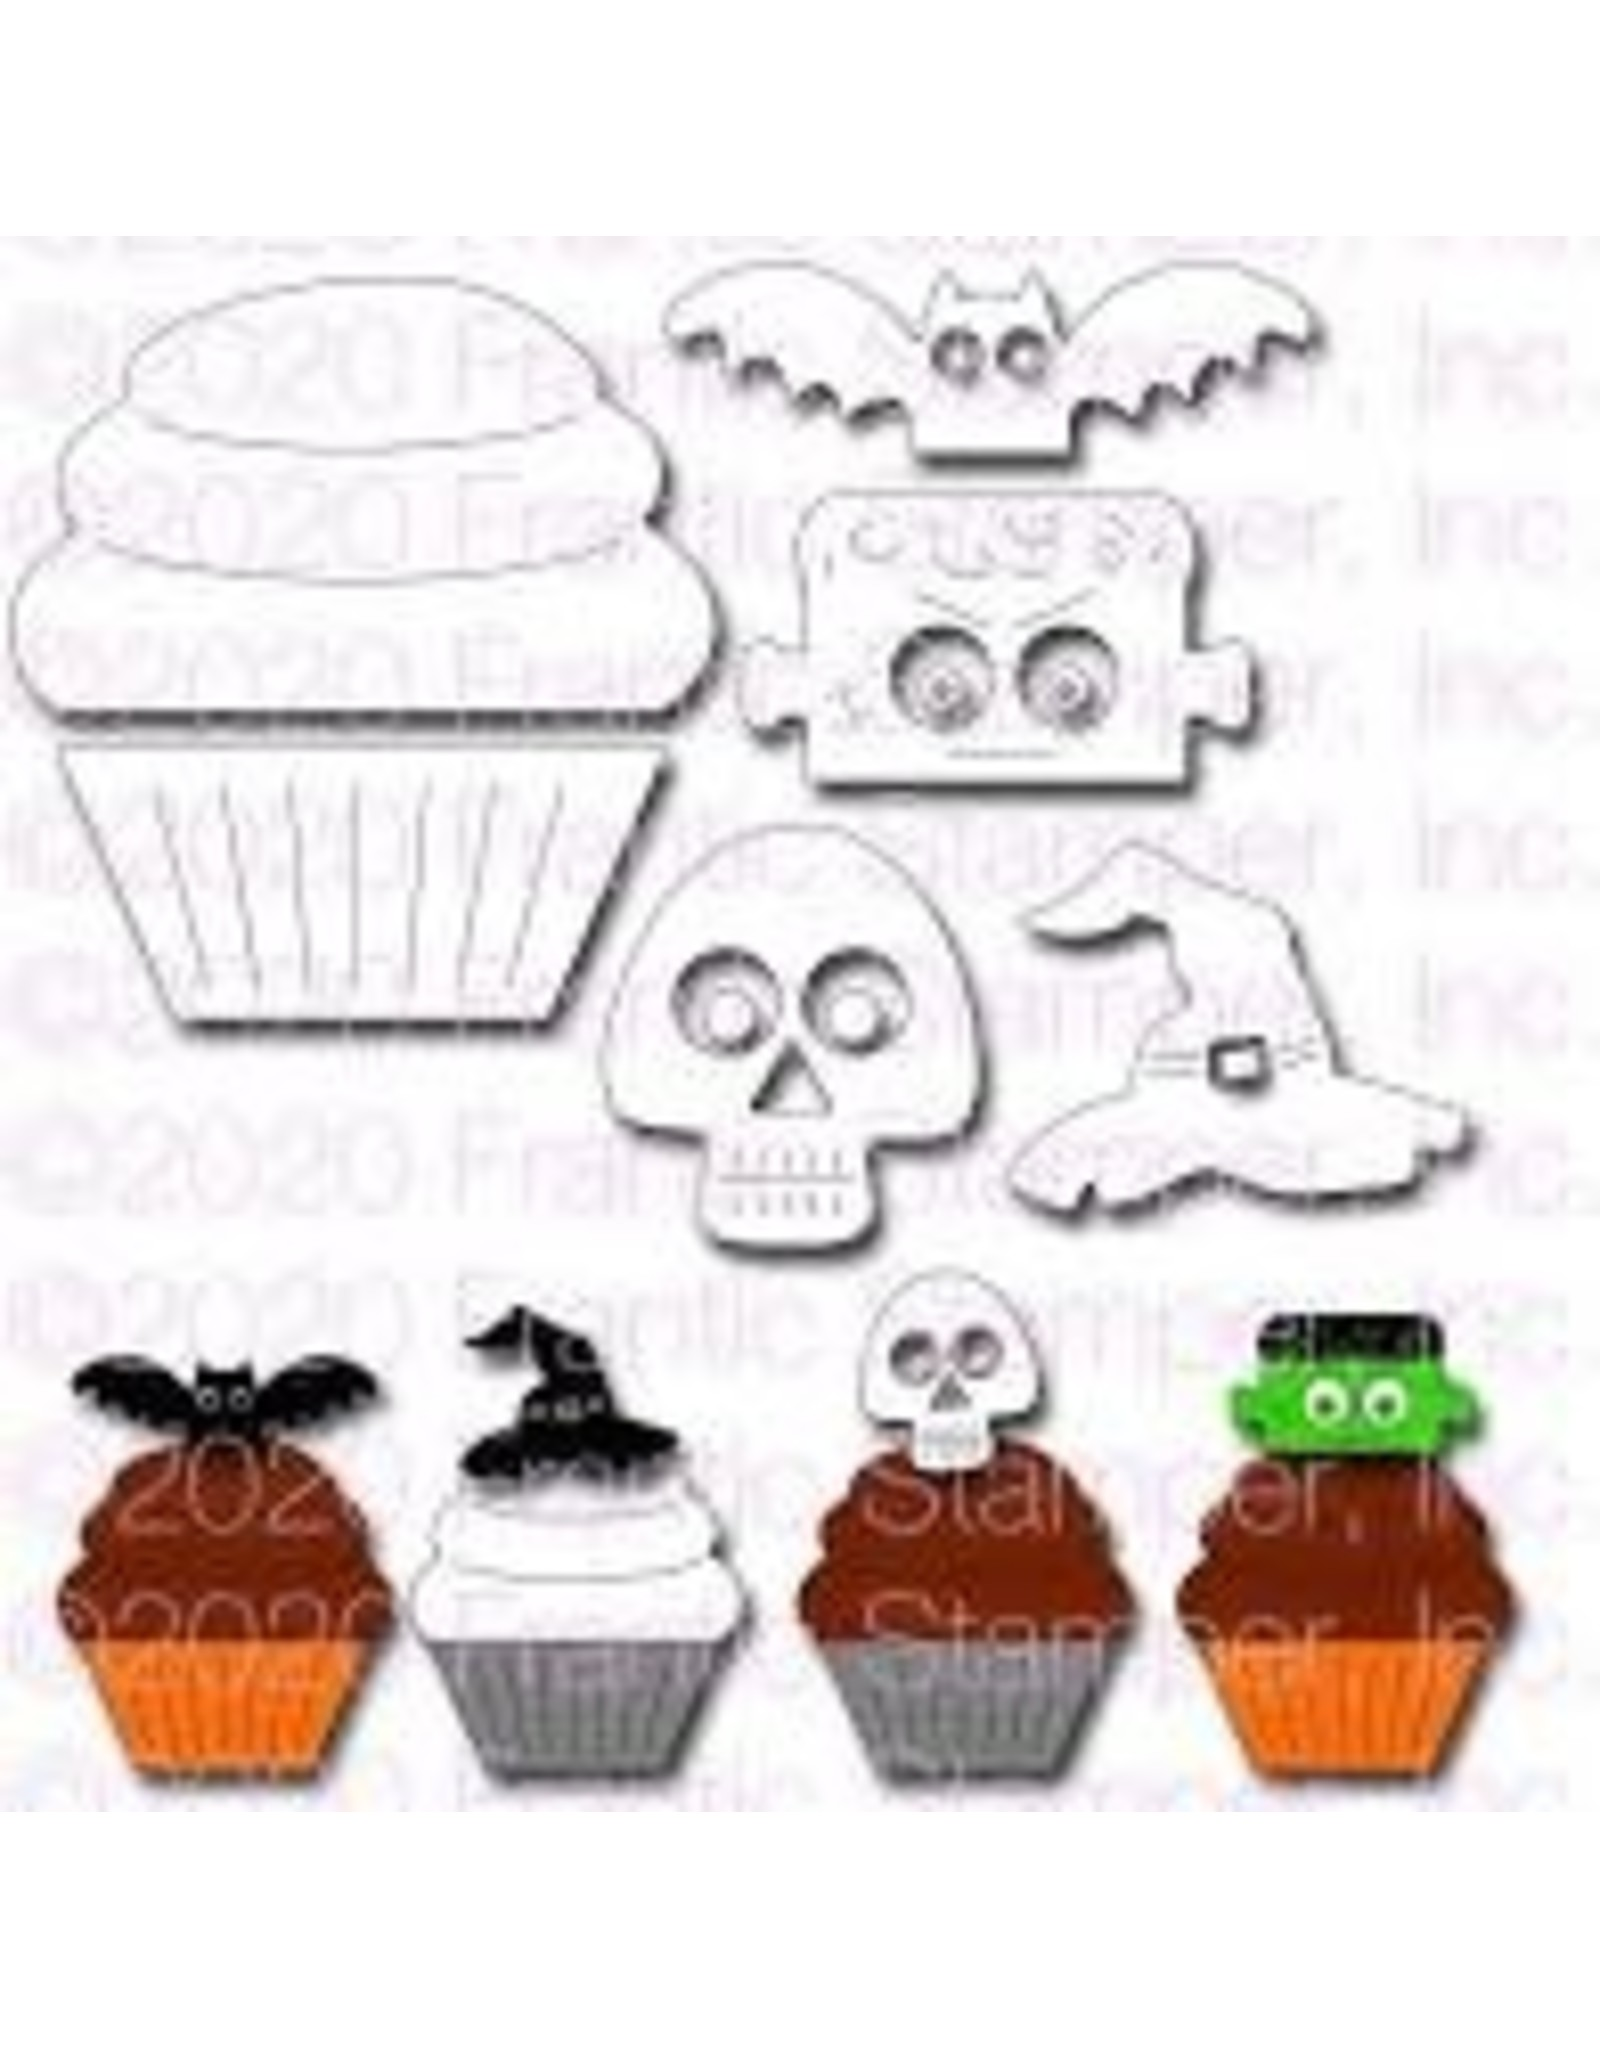 Frantic Stamper Inc Cupcake & Halloween Toppers #1